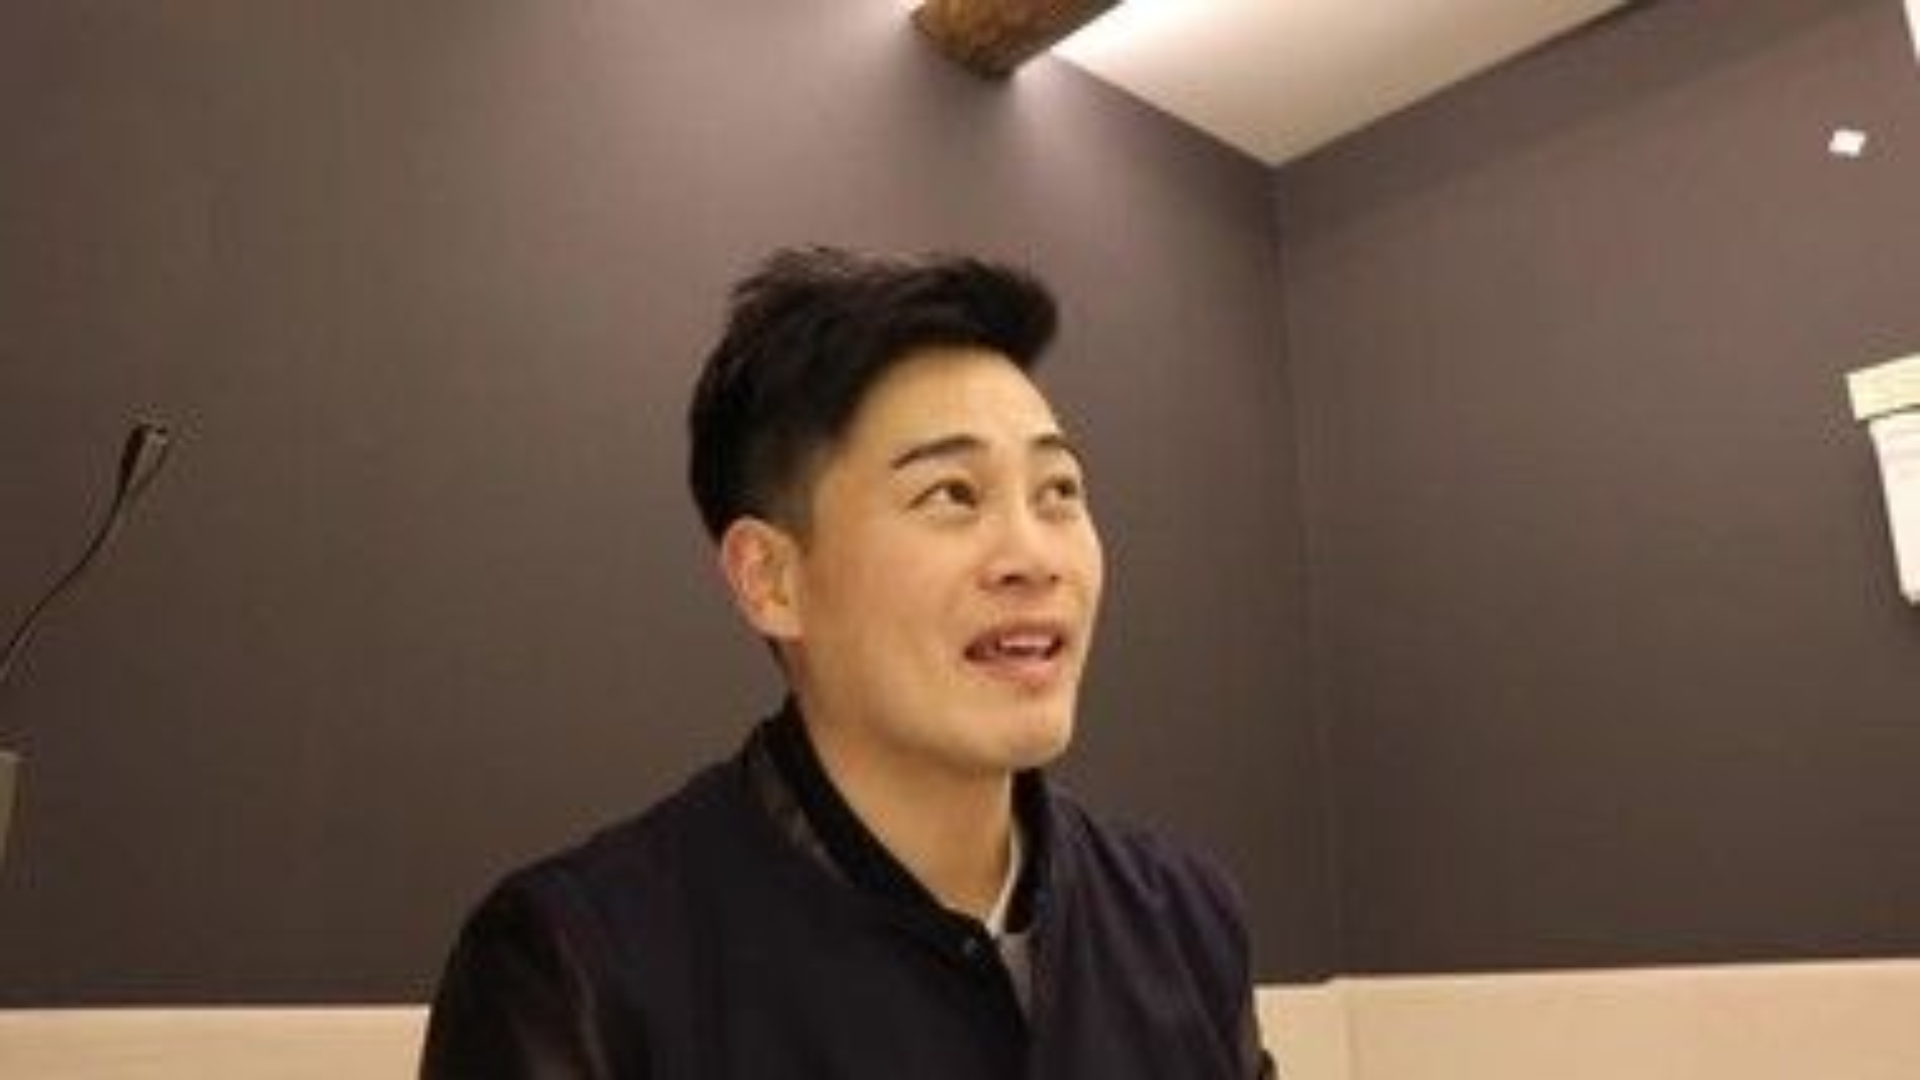 Todo Sobre Corea del Sur Episode 157: Korean Incheon International Airport Capsule Hotel Tour